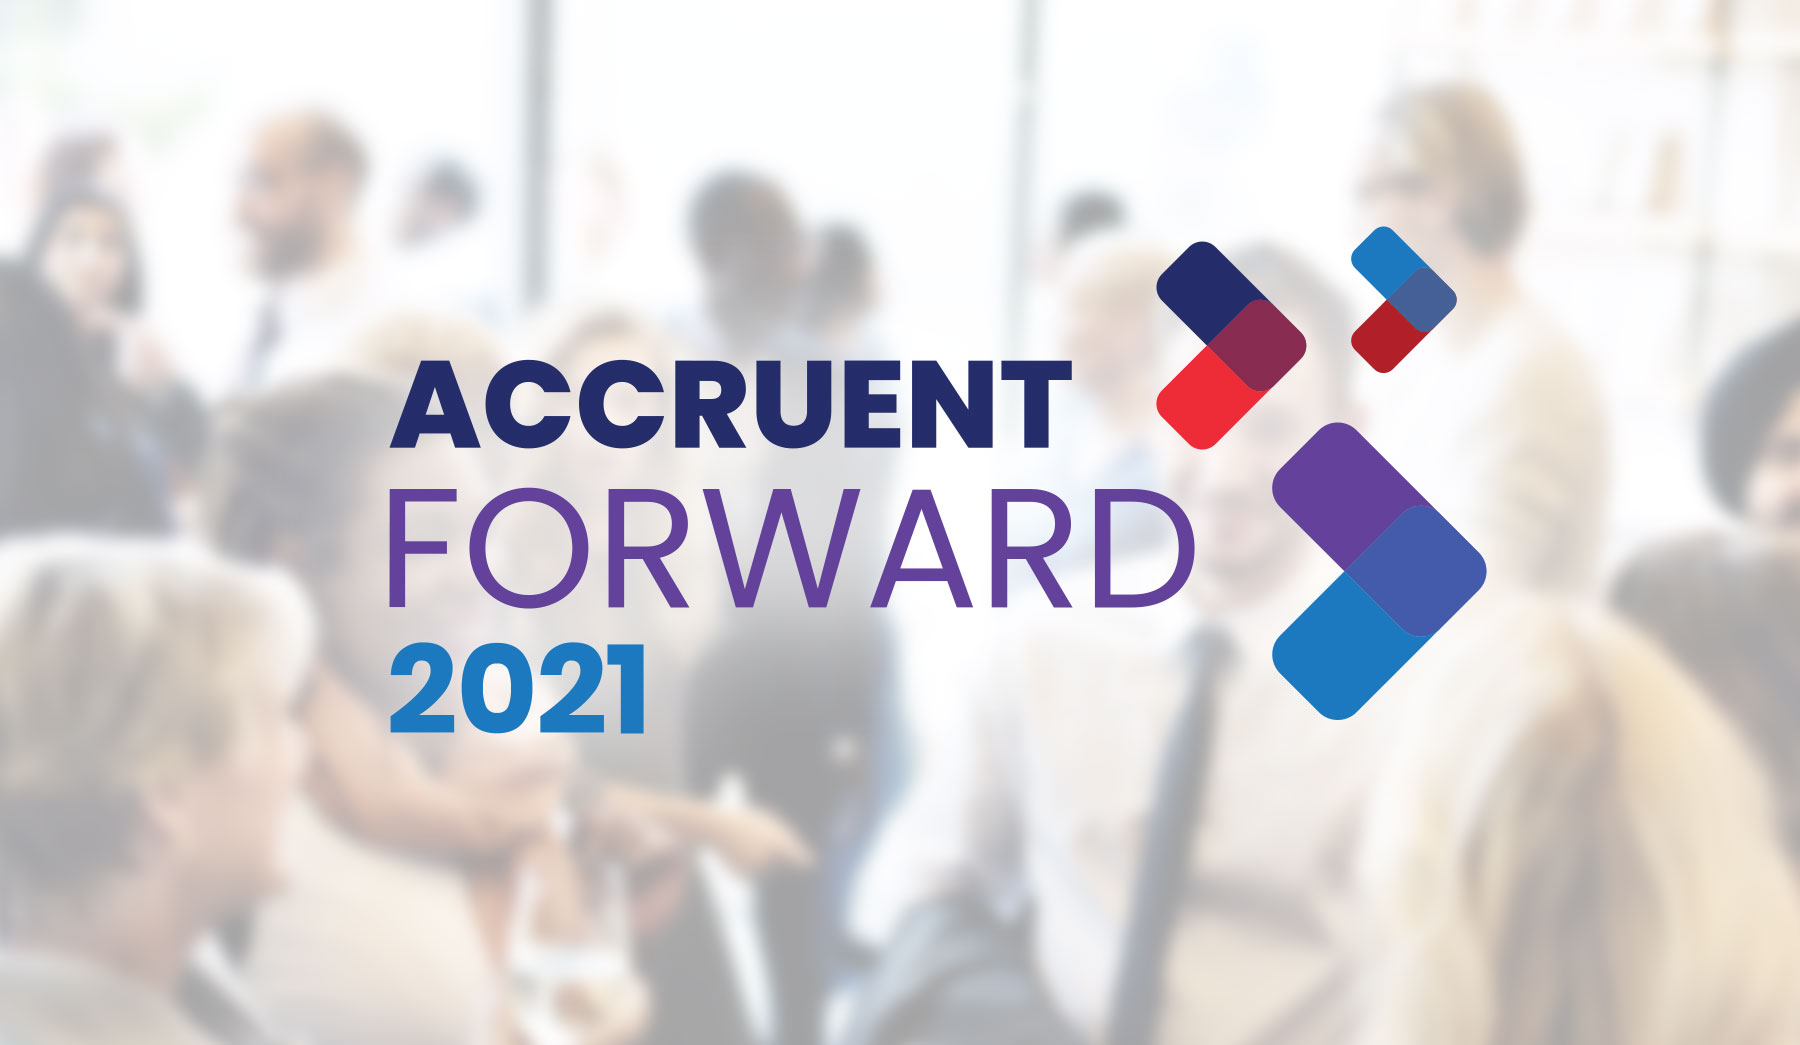 Accruent - Resources - Event - Accruent Forward vx Maintain - Hero